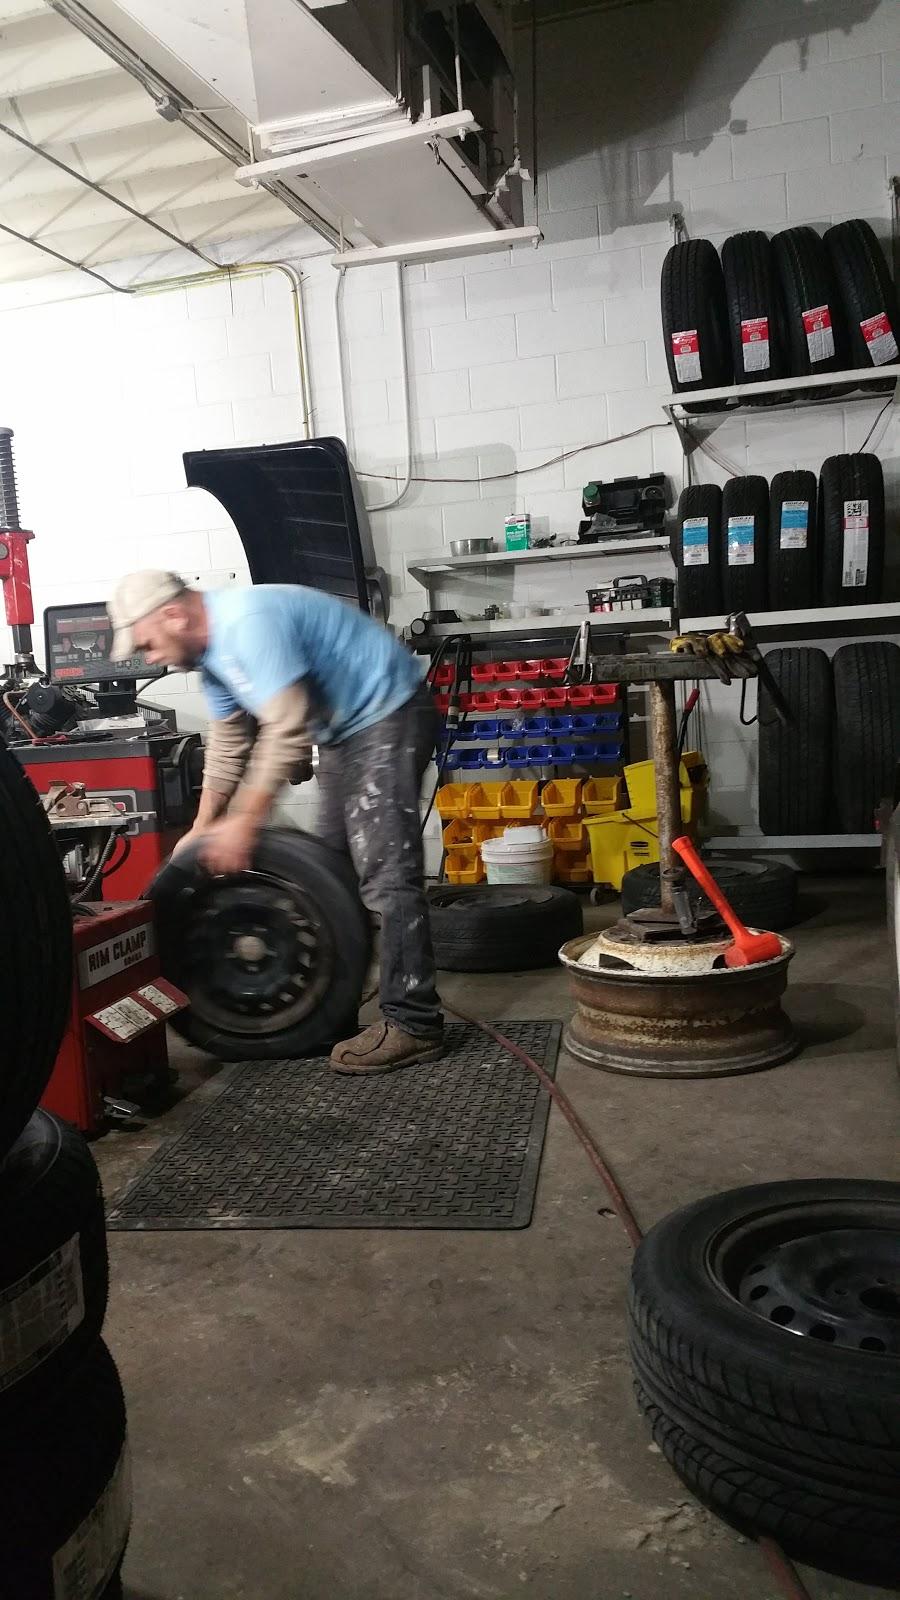 e-z tire shop - car repair  | Photo 1 of 1 | Address: 603 W Broadway St, Eden, TX 76837, USA | Phone: (325) 456-2806